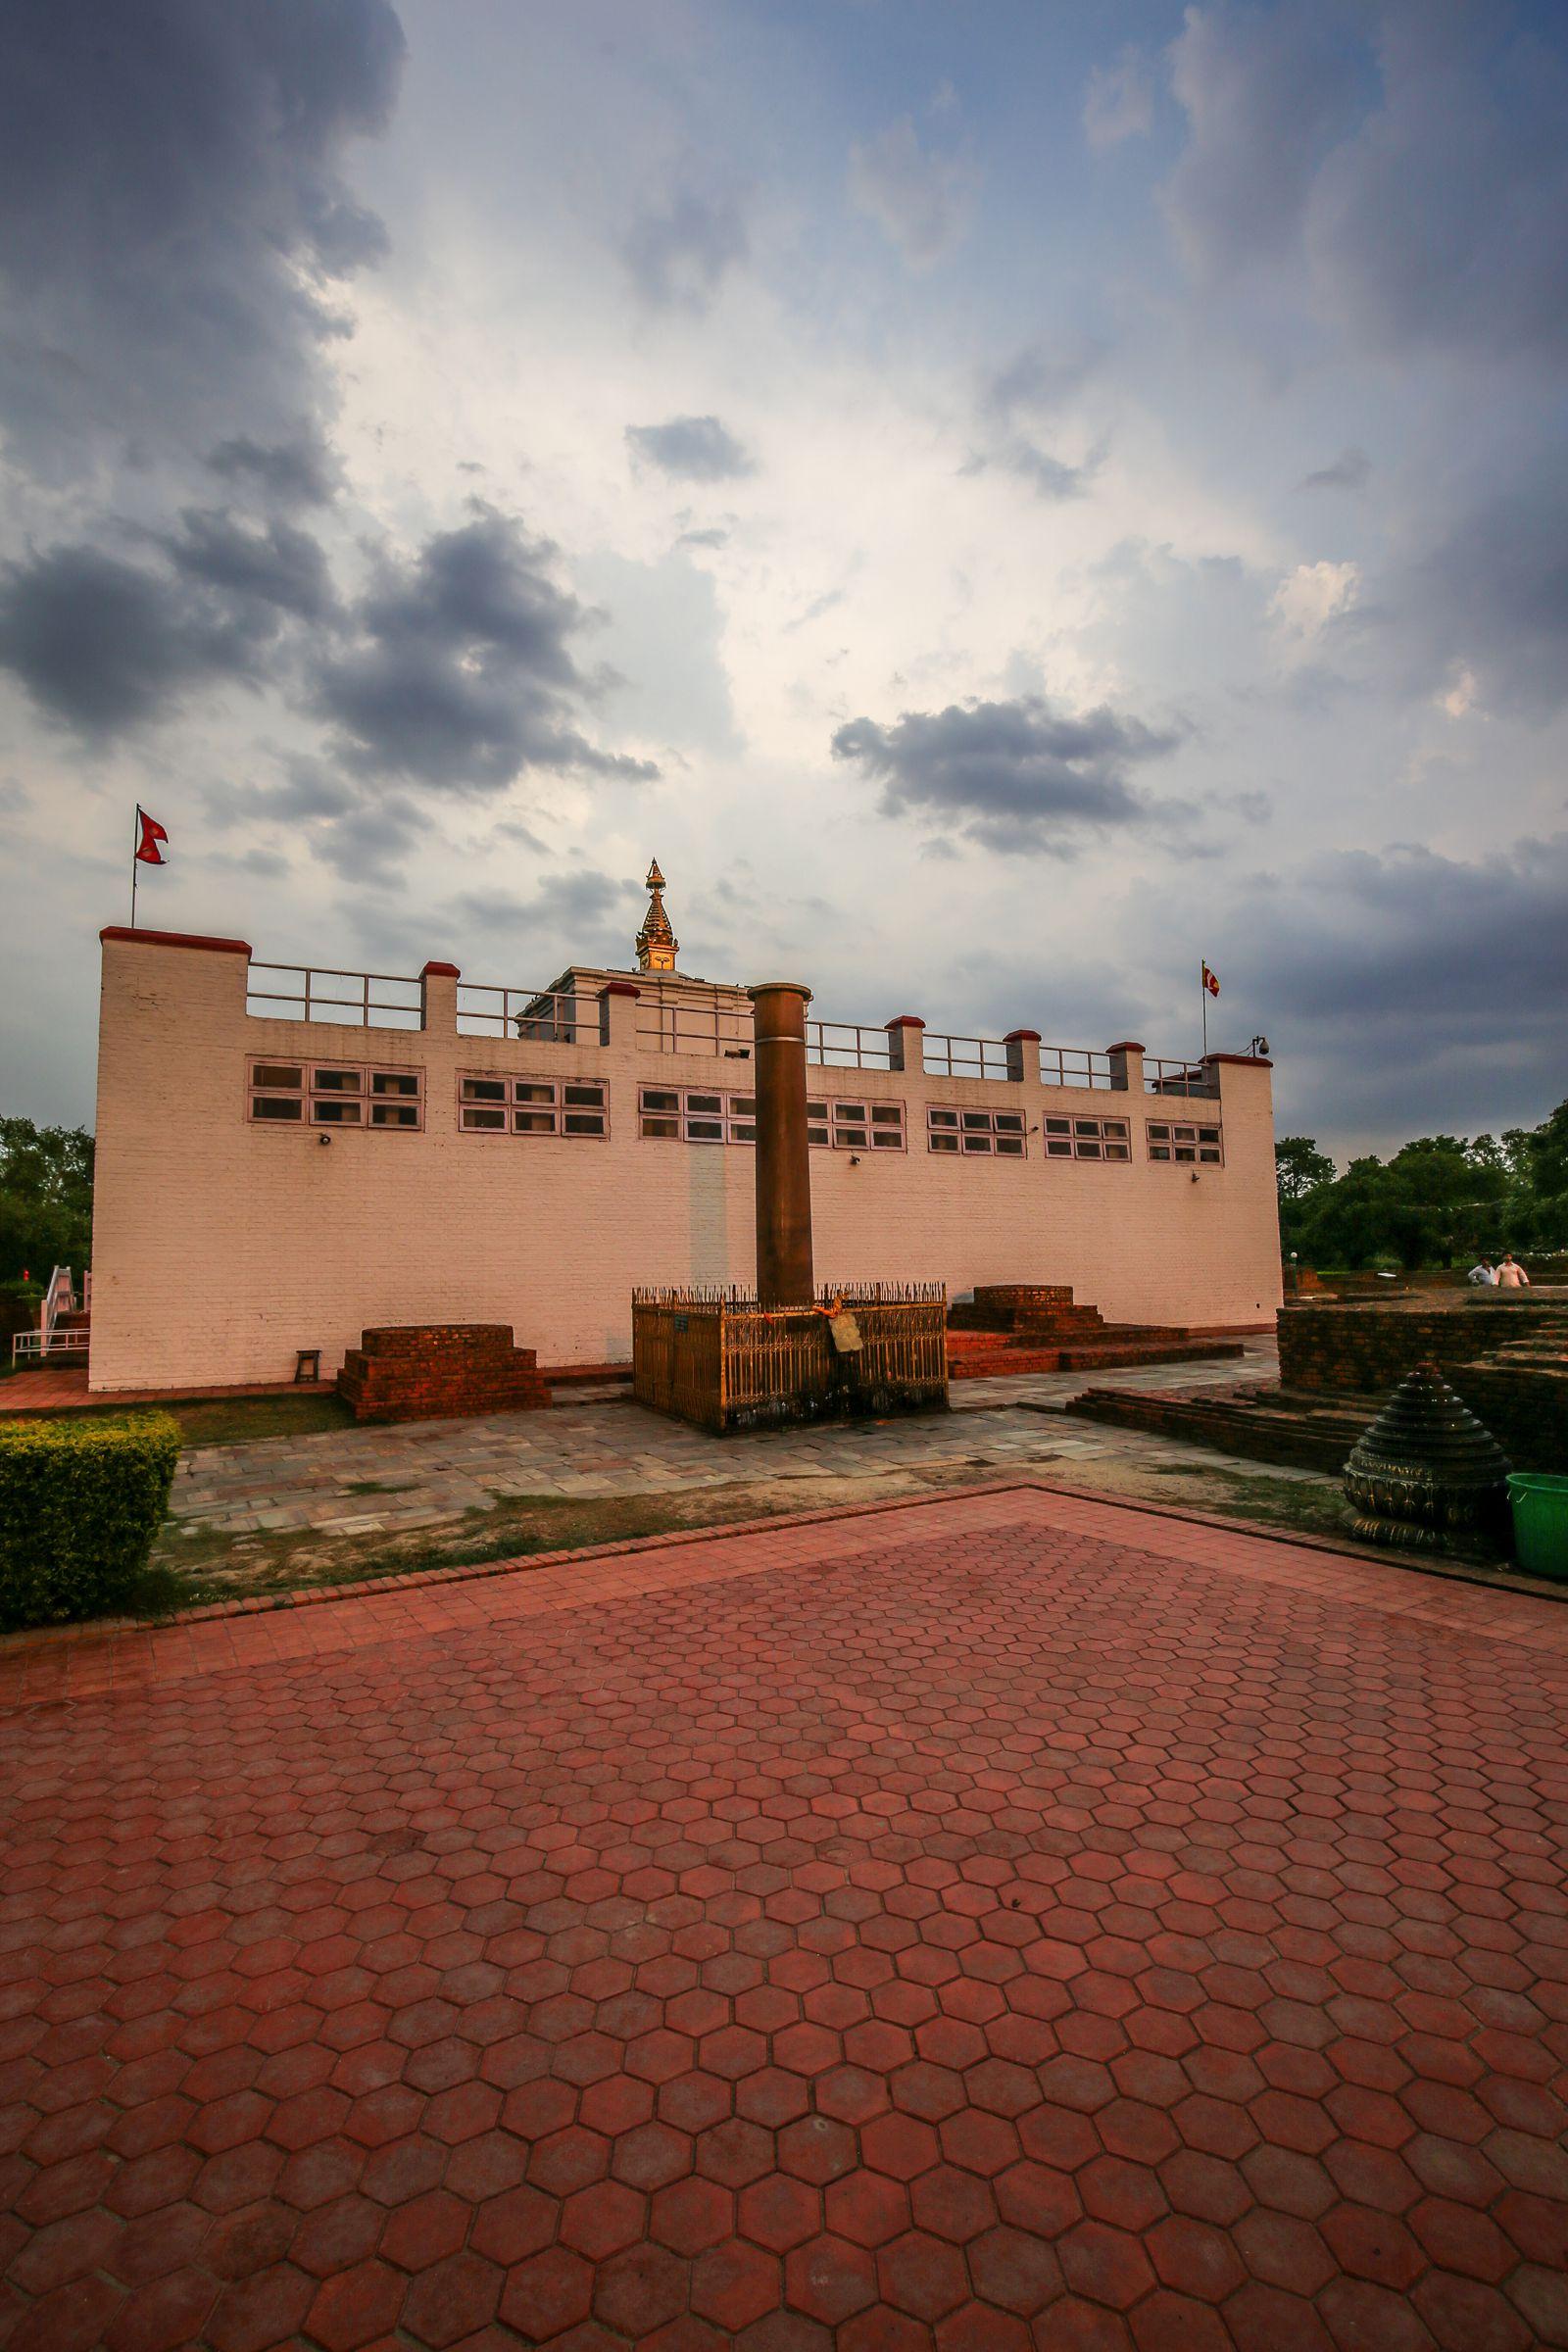 Photos And Postcards From Nepal... Chitwan, Kathmandu, Bhaktapur, Panauti, Pokhara, Tansen, Palpa, Lumbini (28)